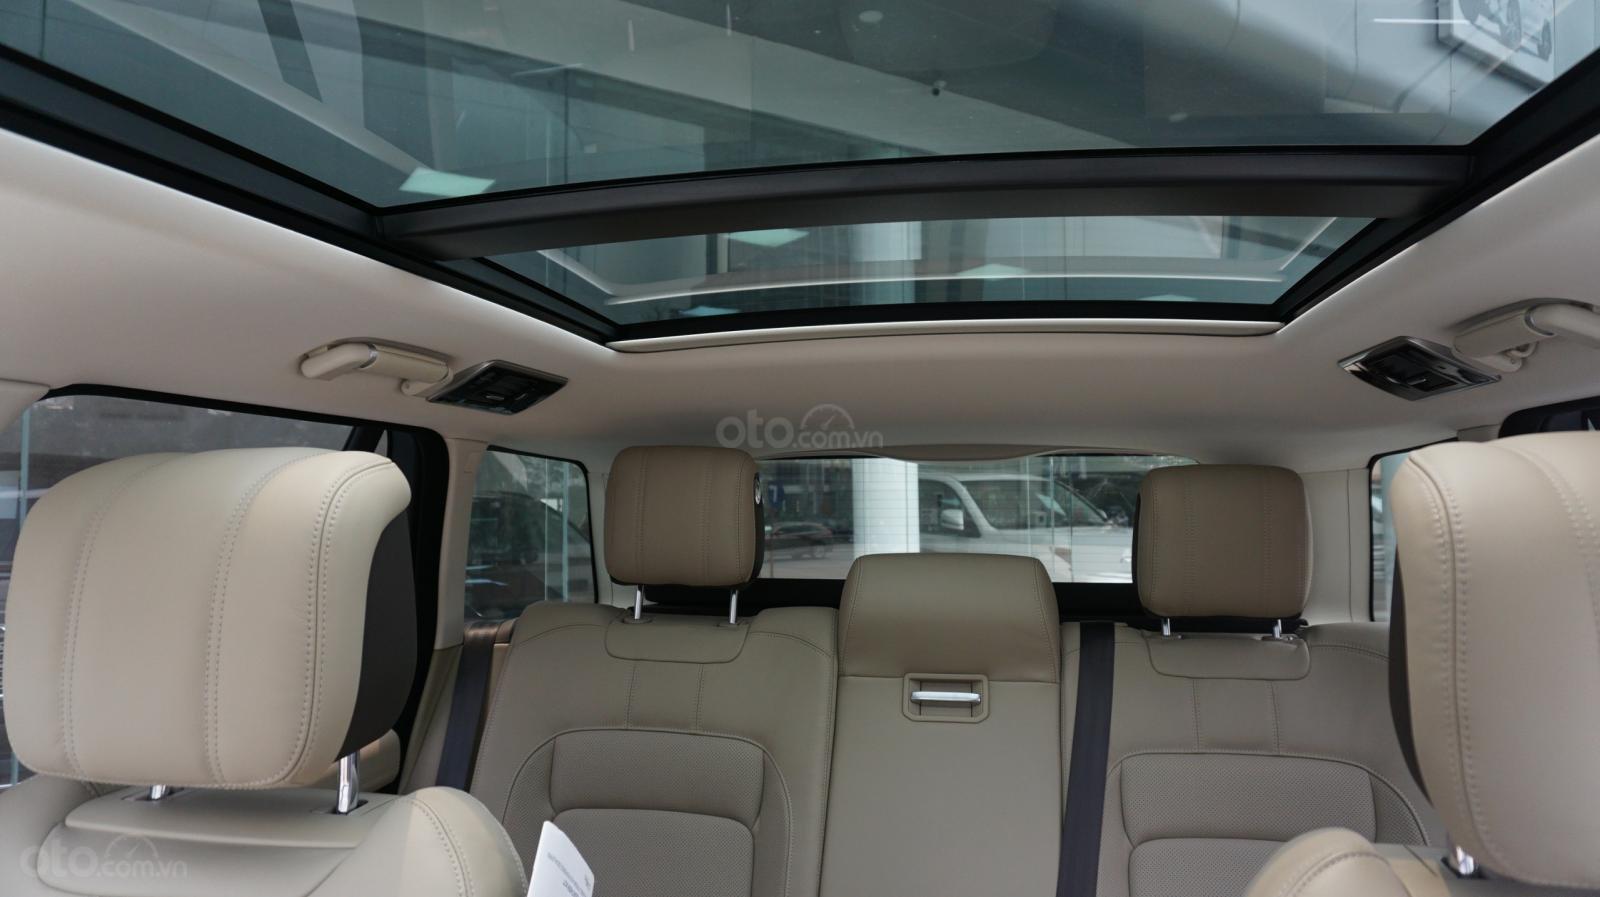 Cần bán xe LandRover Range Rover HSE năm 2019, màu trắng, xe nhập-2